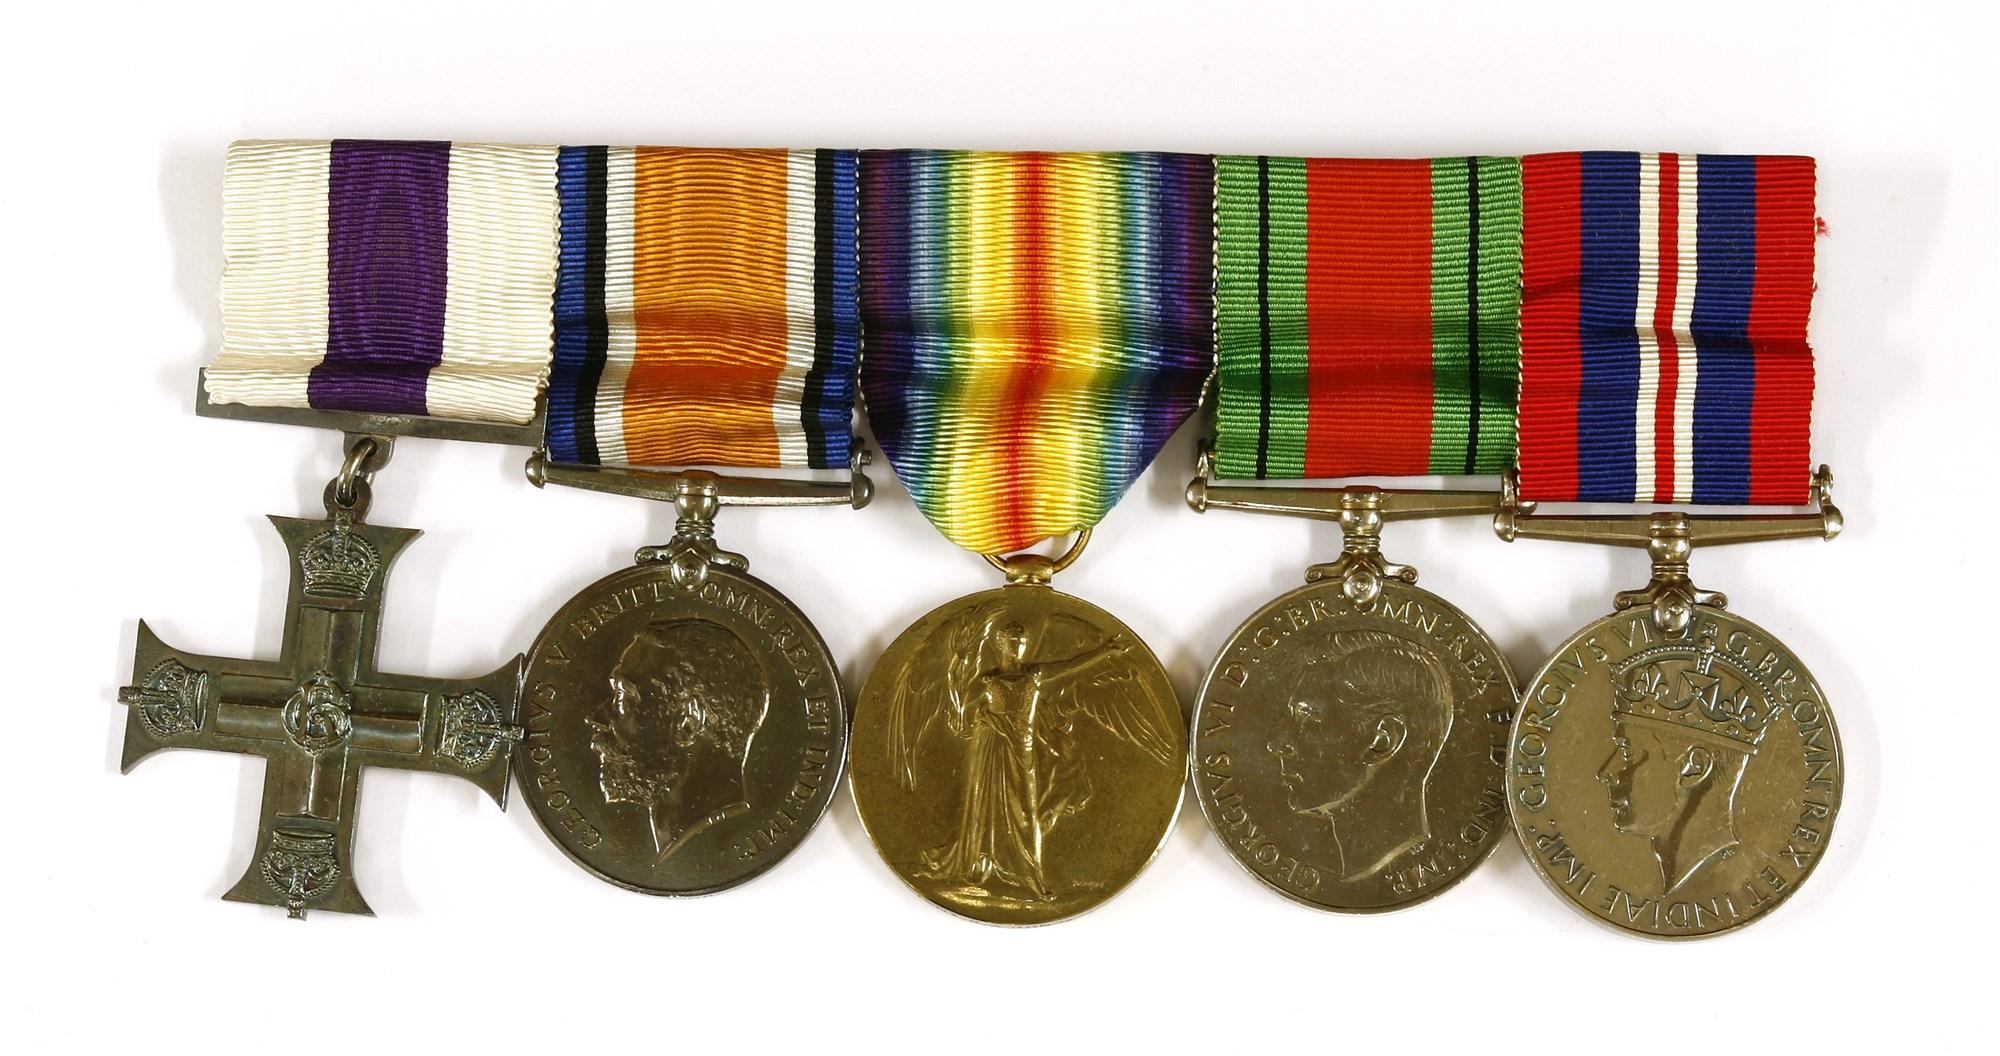 Medals awarded to Lieutenant Gerald Aubrey Bond